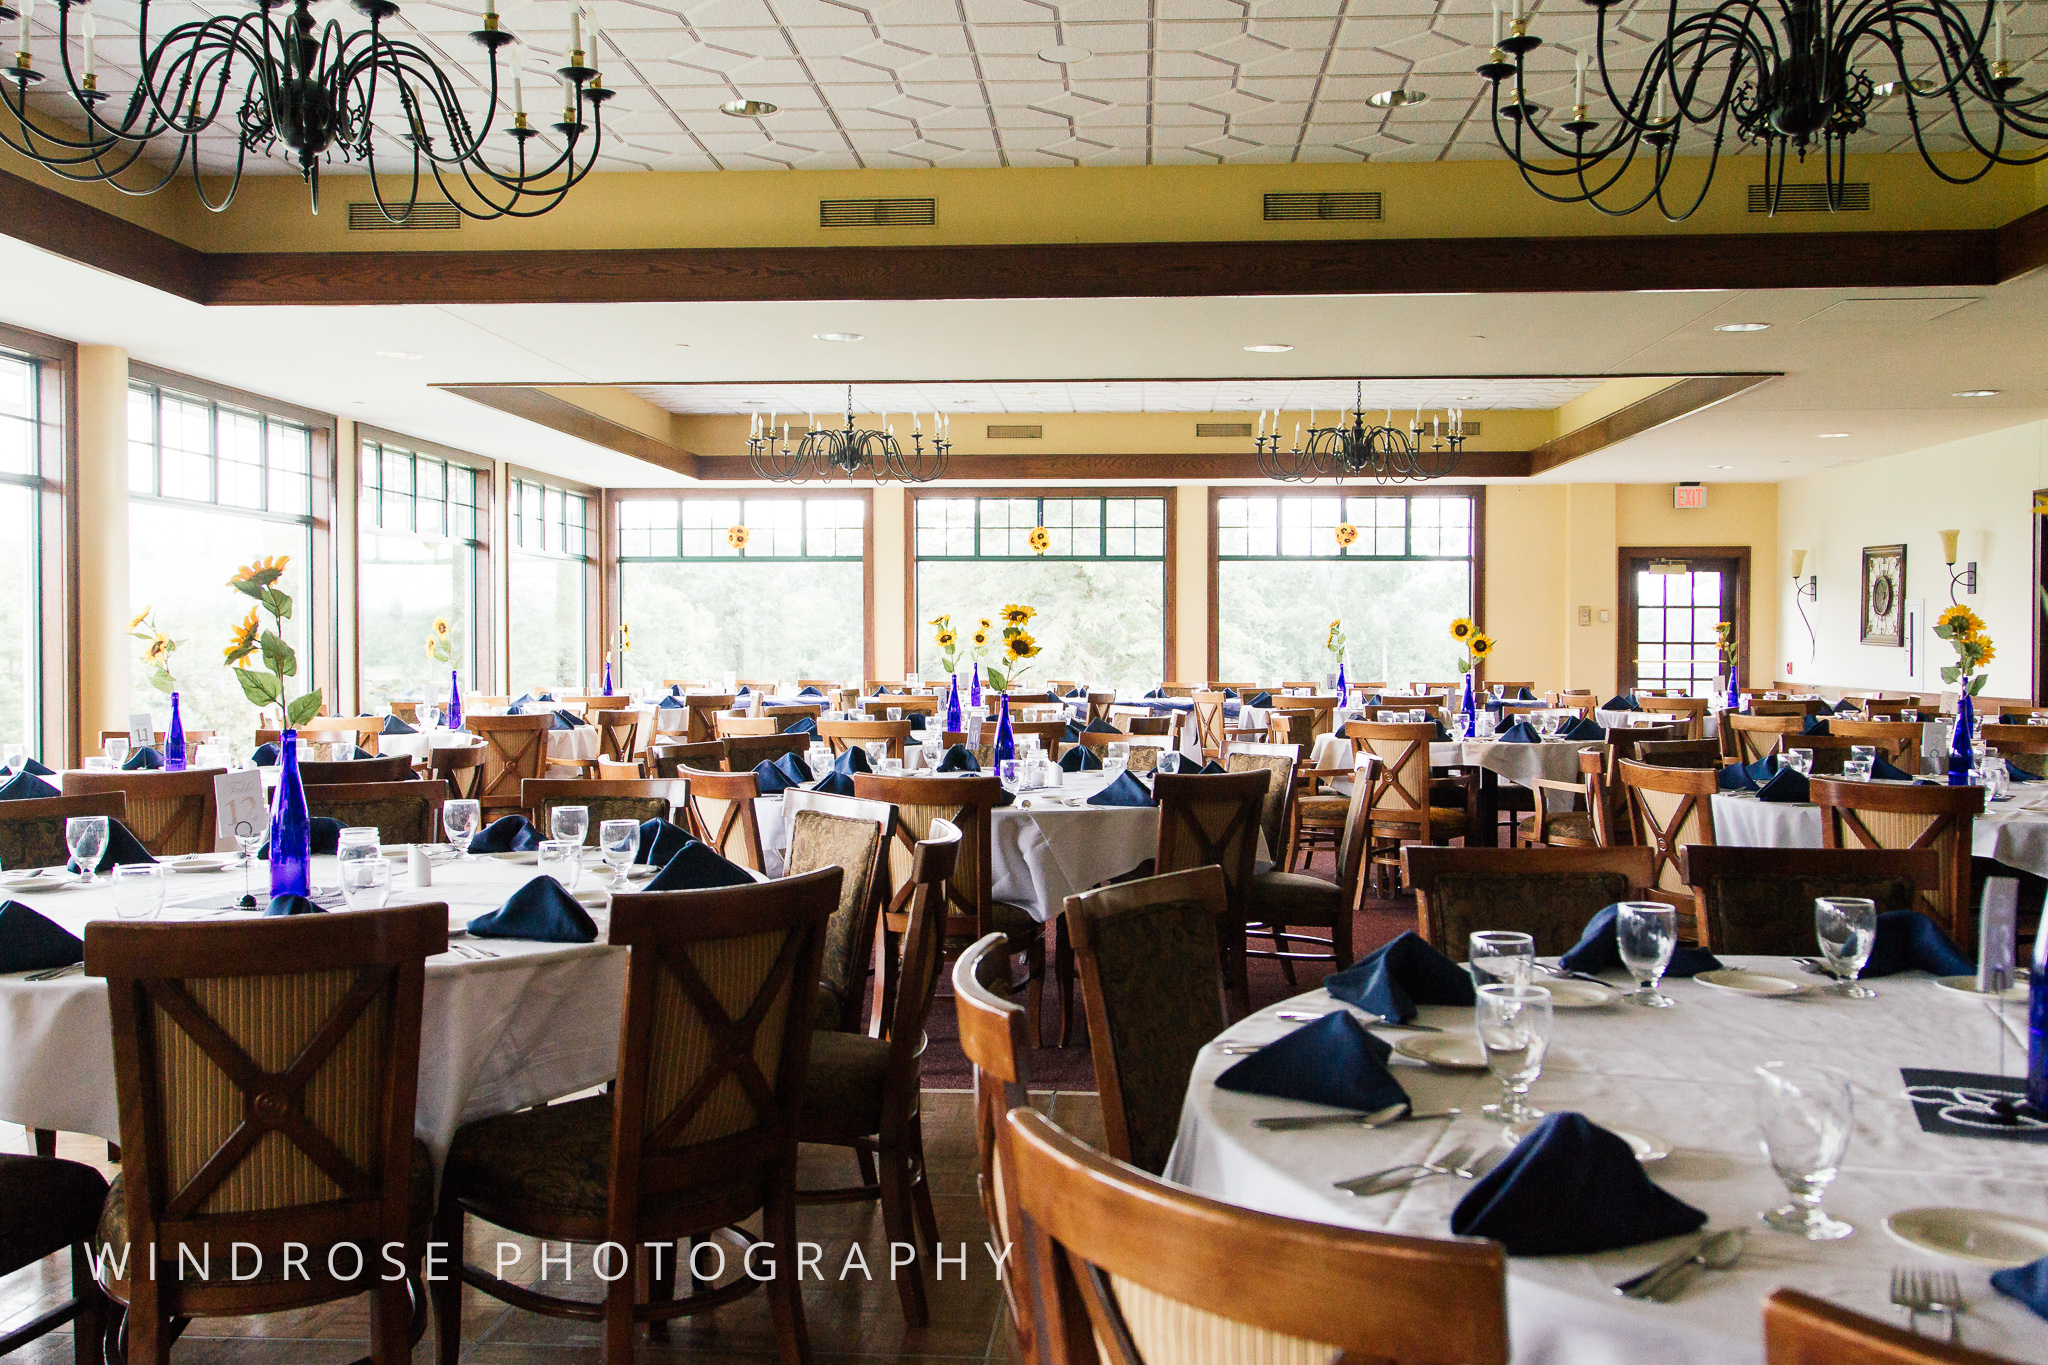 La-Crosse-Country-Club-Wedding-Minnesota-Wedding-Photographer-3.jpg